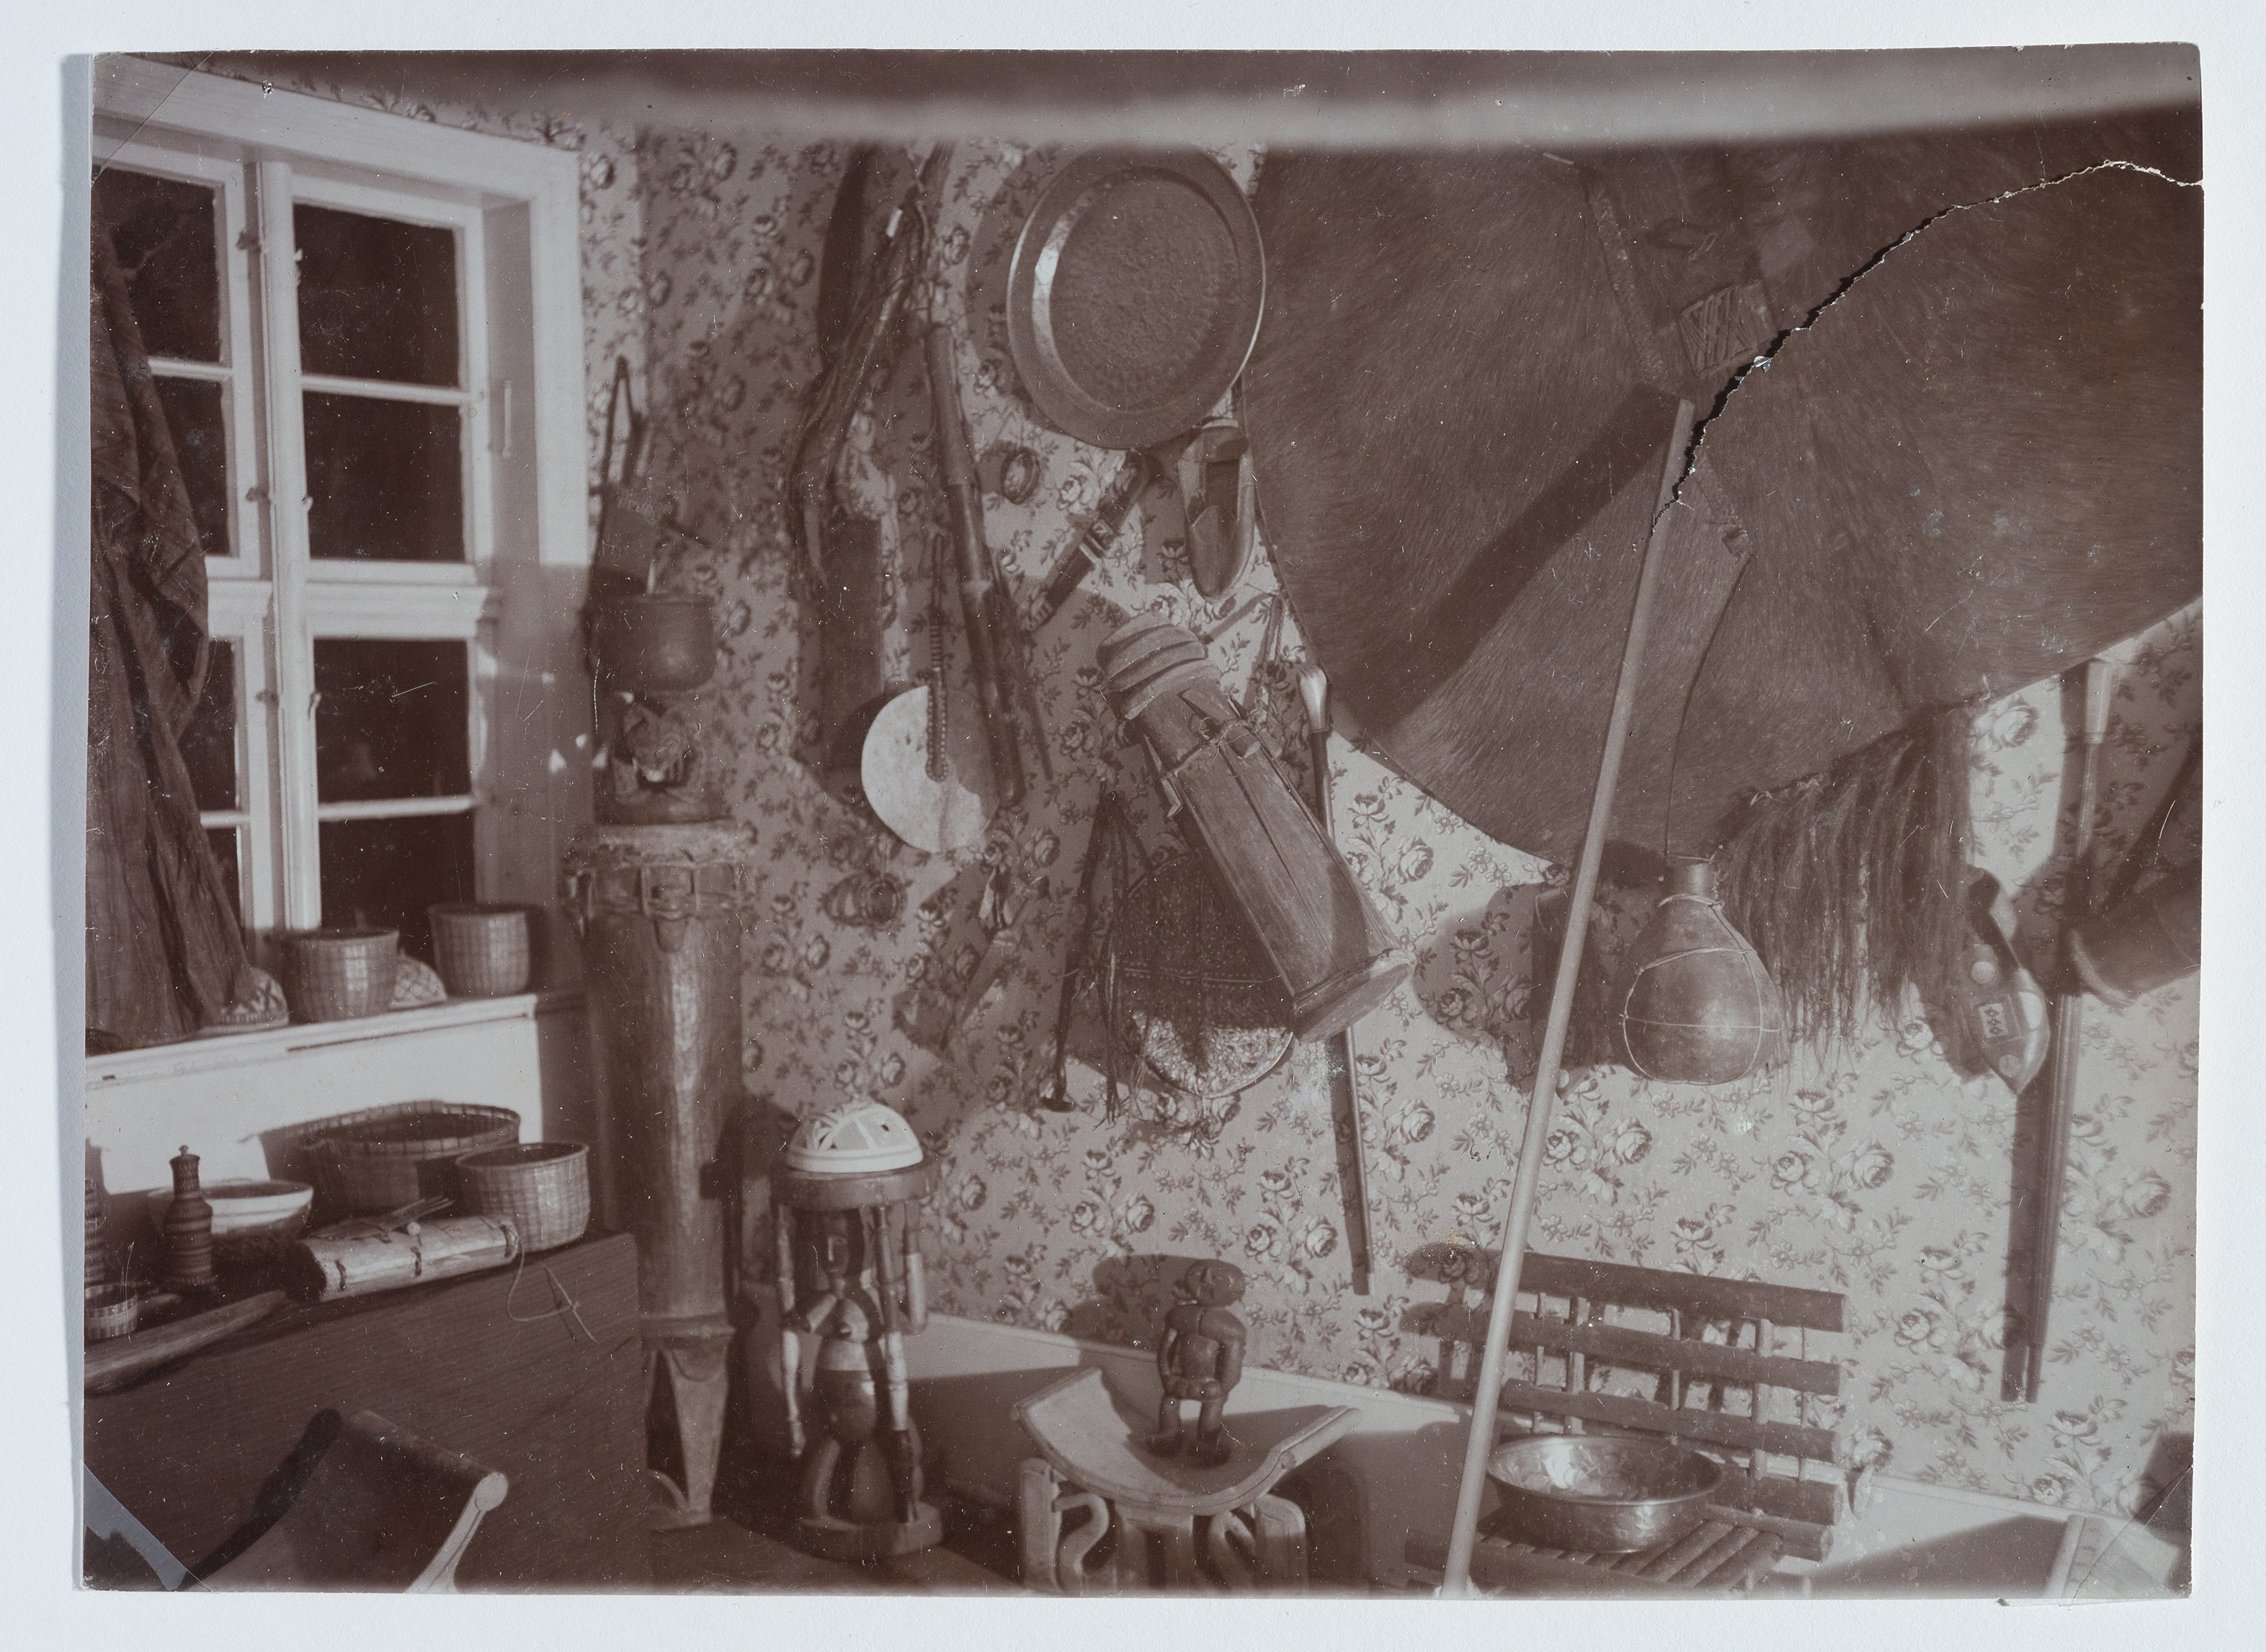 Georg Ipscher's 'Africa room' in his house in Wusterhausen, photograph, before 1935 (Wegemuseum Wusterhausen, CC BY-MC-SA))